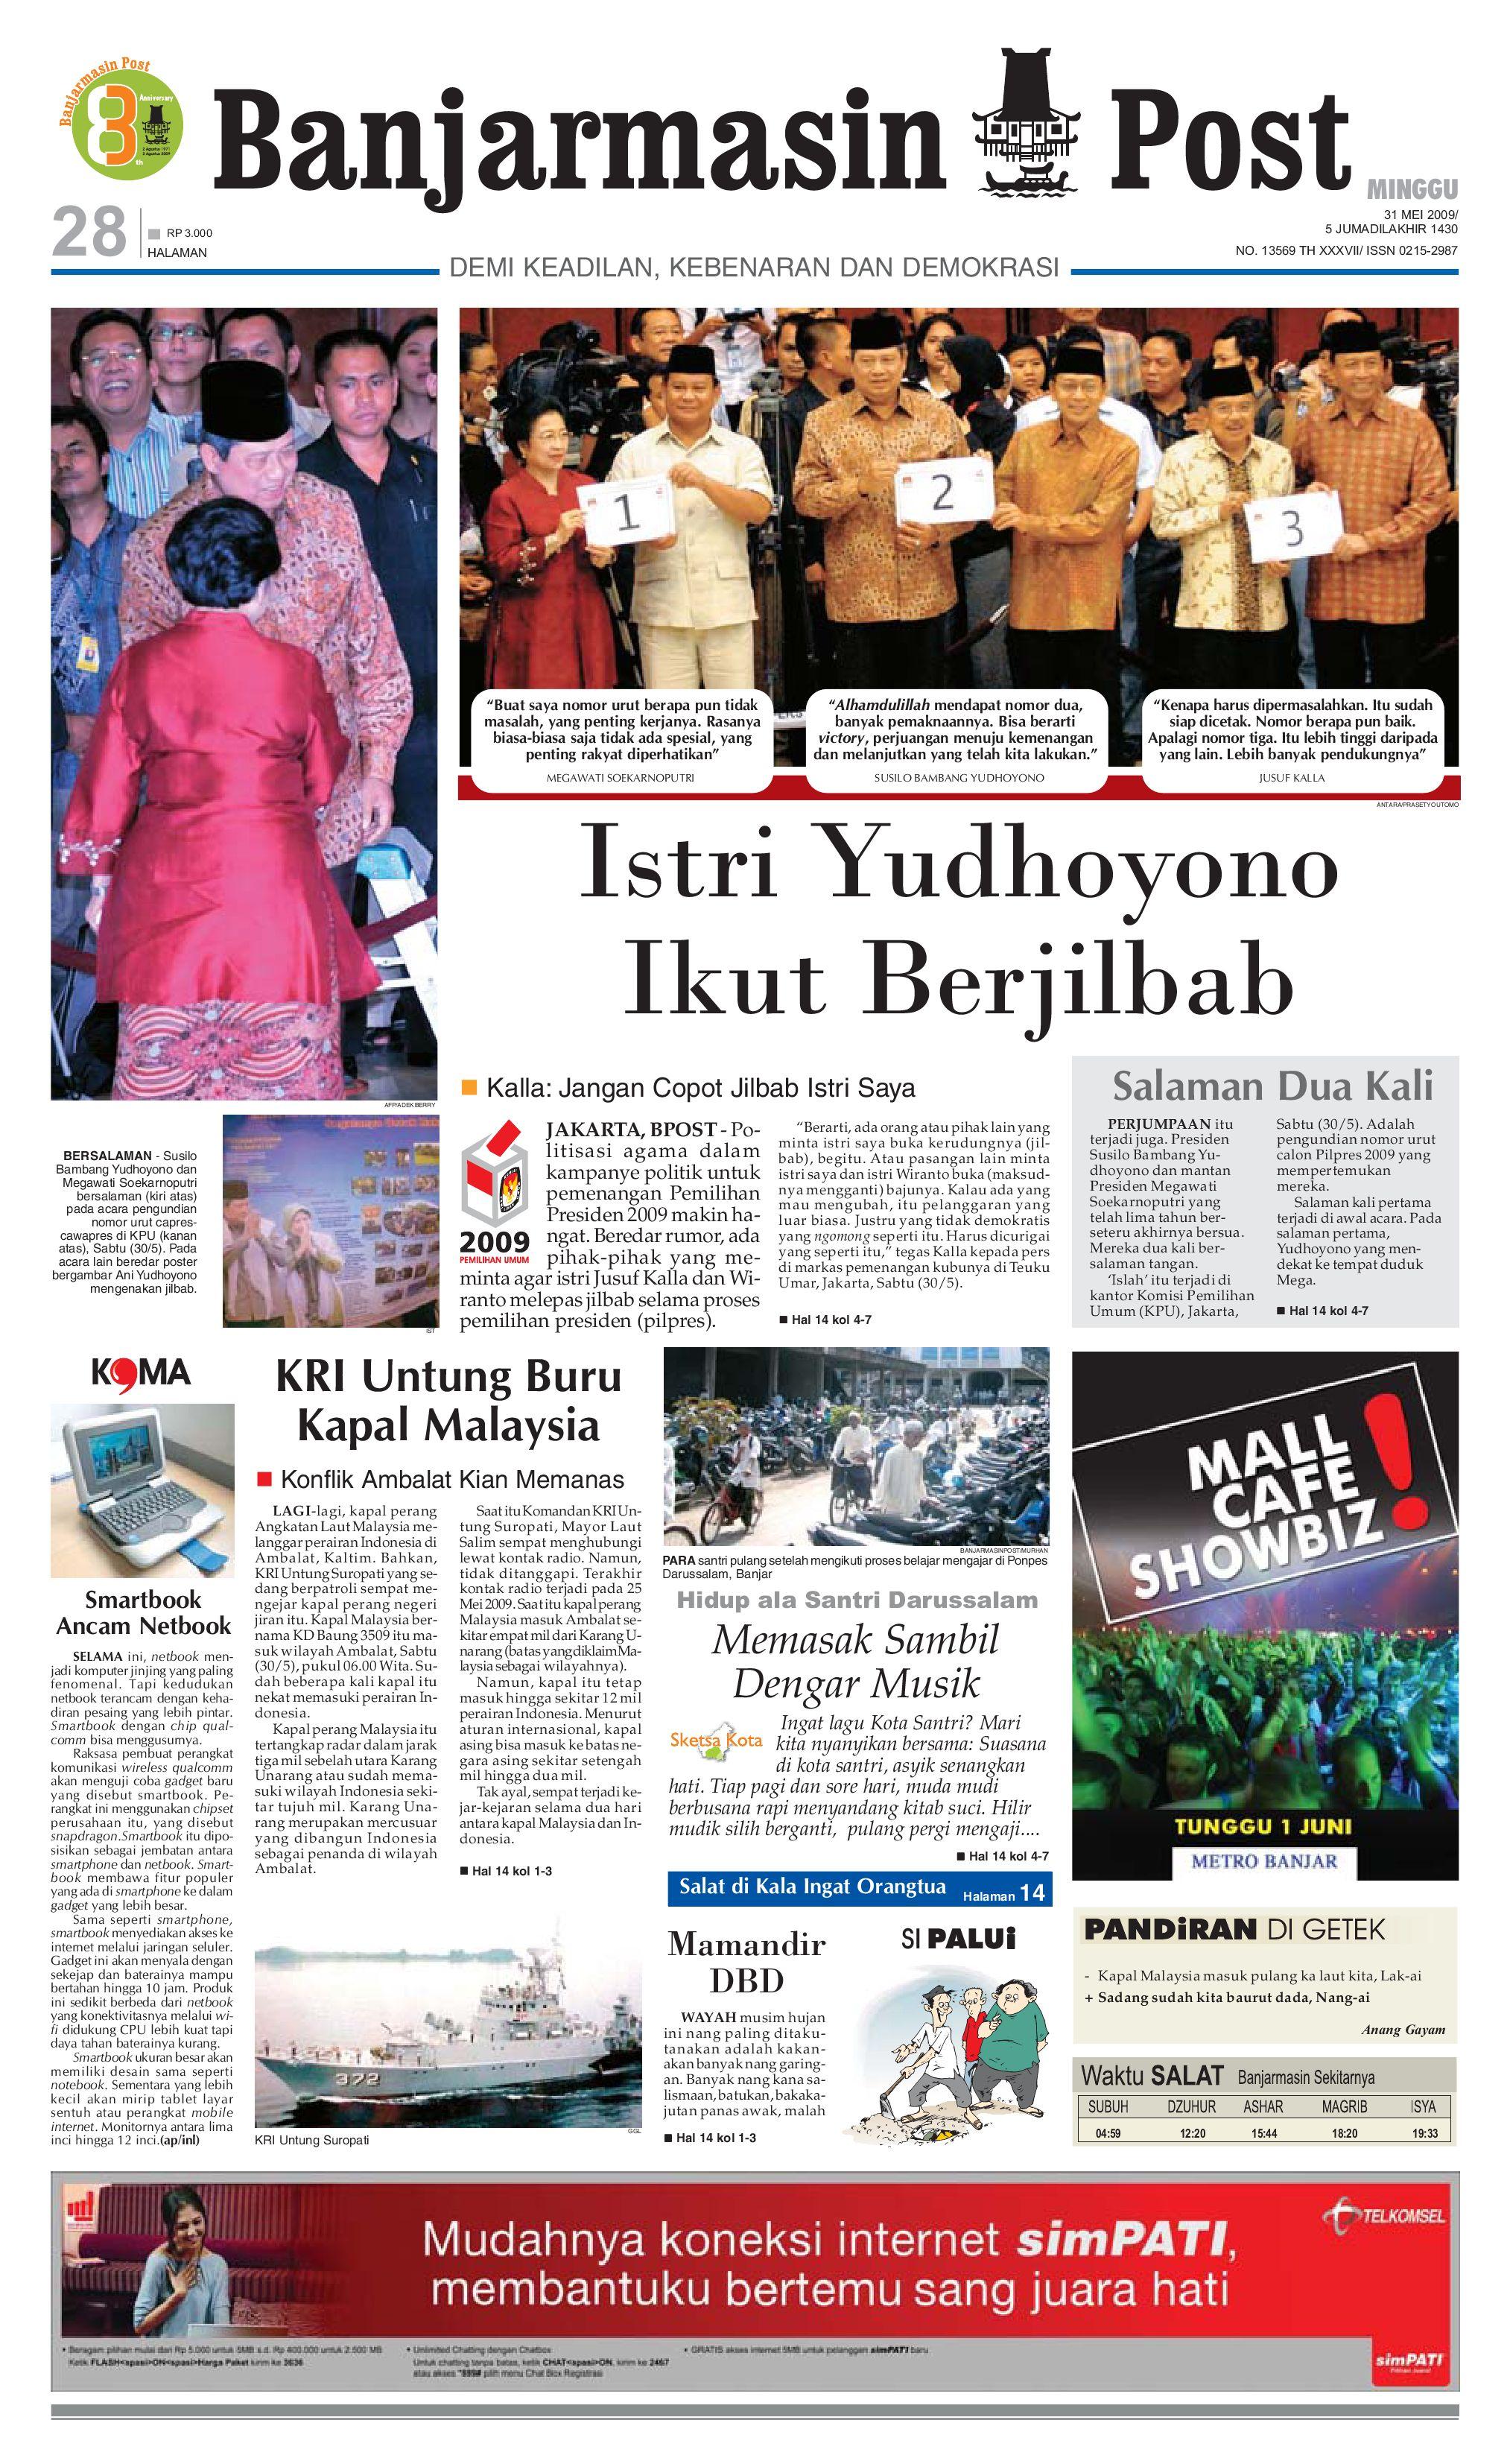 Banjarmasin Post 31 Mei 2009 By Issuu Tcash Vaganza 17 Baselayer Long Pants